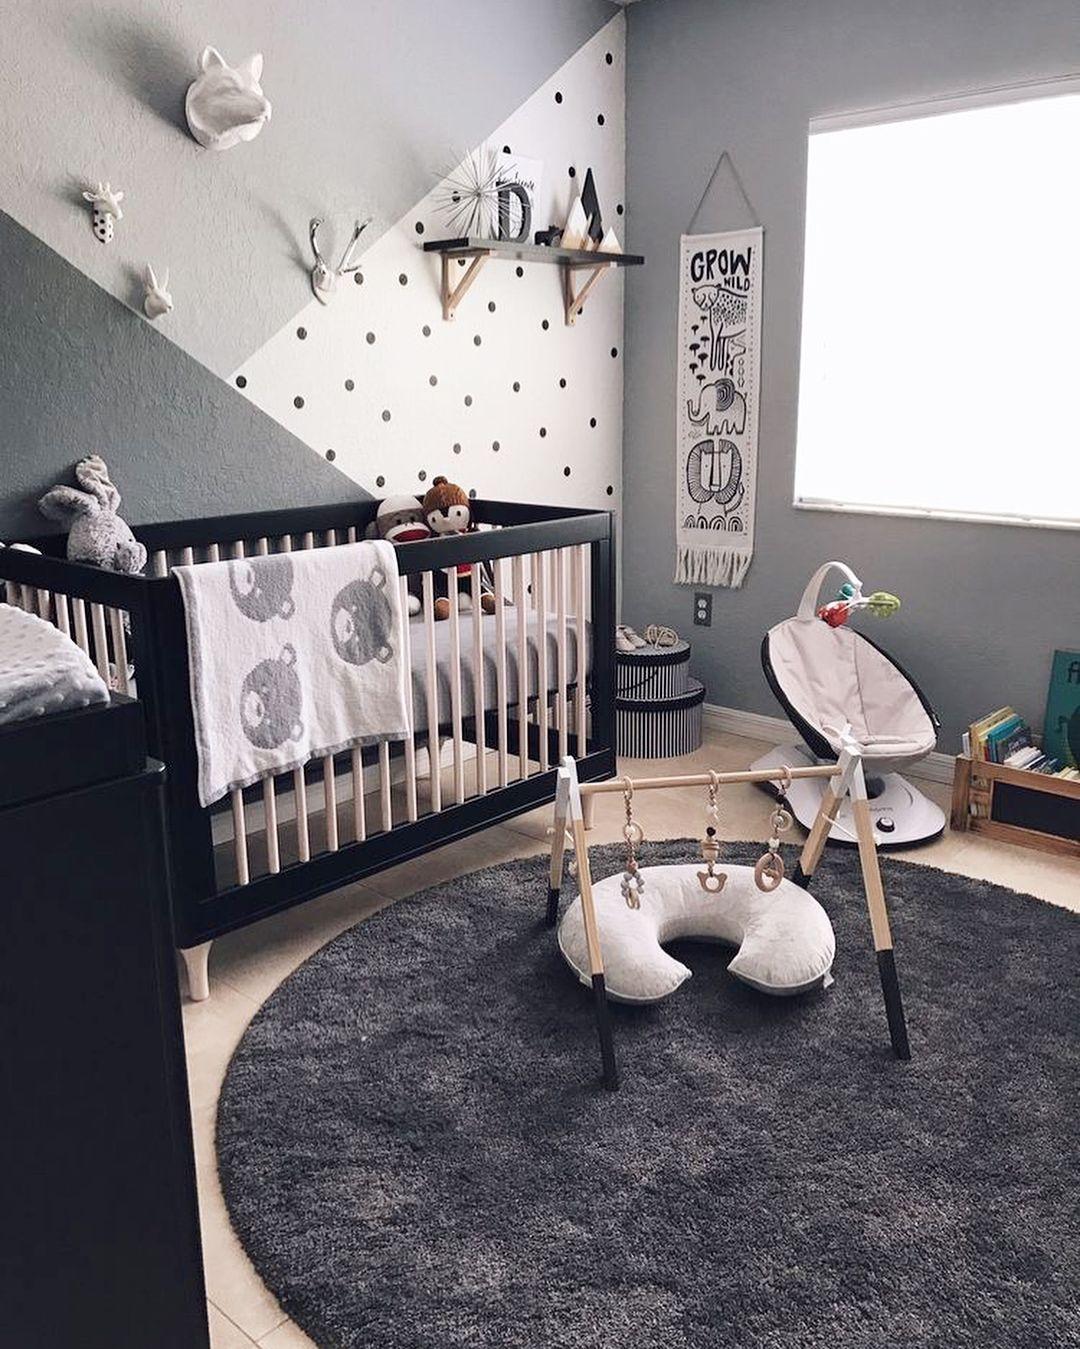 Pilih Warna Kamar Untuk Si Kecil Tidak Melulu Terbatas Dengan Pilihan Warna Warna Pastel Kombinasi Warna Abu Abu Juga Ruangan Bayi Kamar Bayi Kamar Main Anak